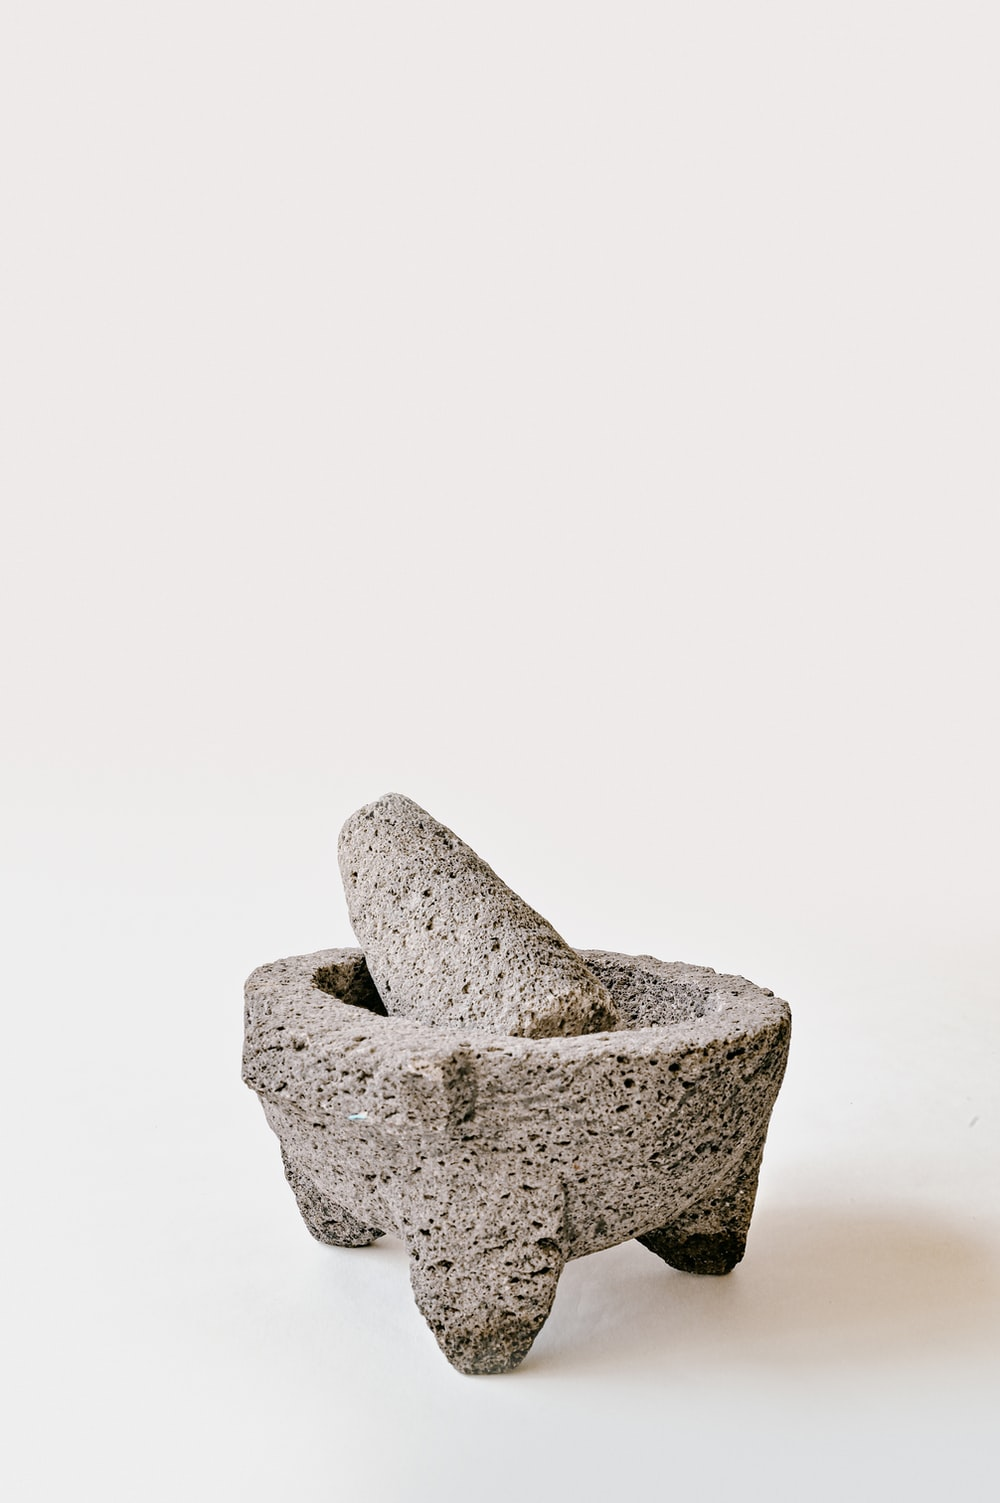 gray stone on white surface